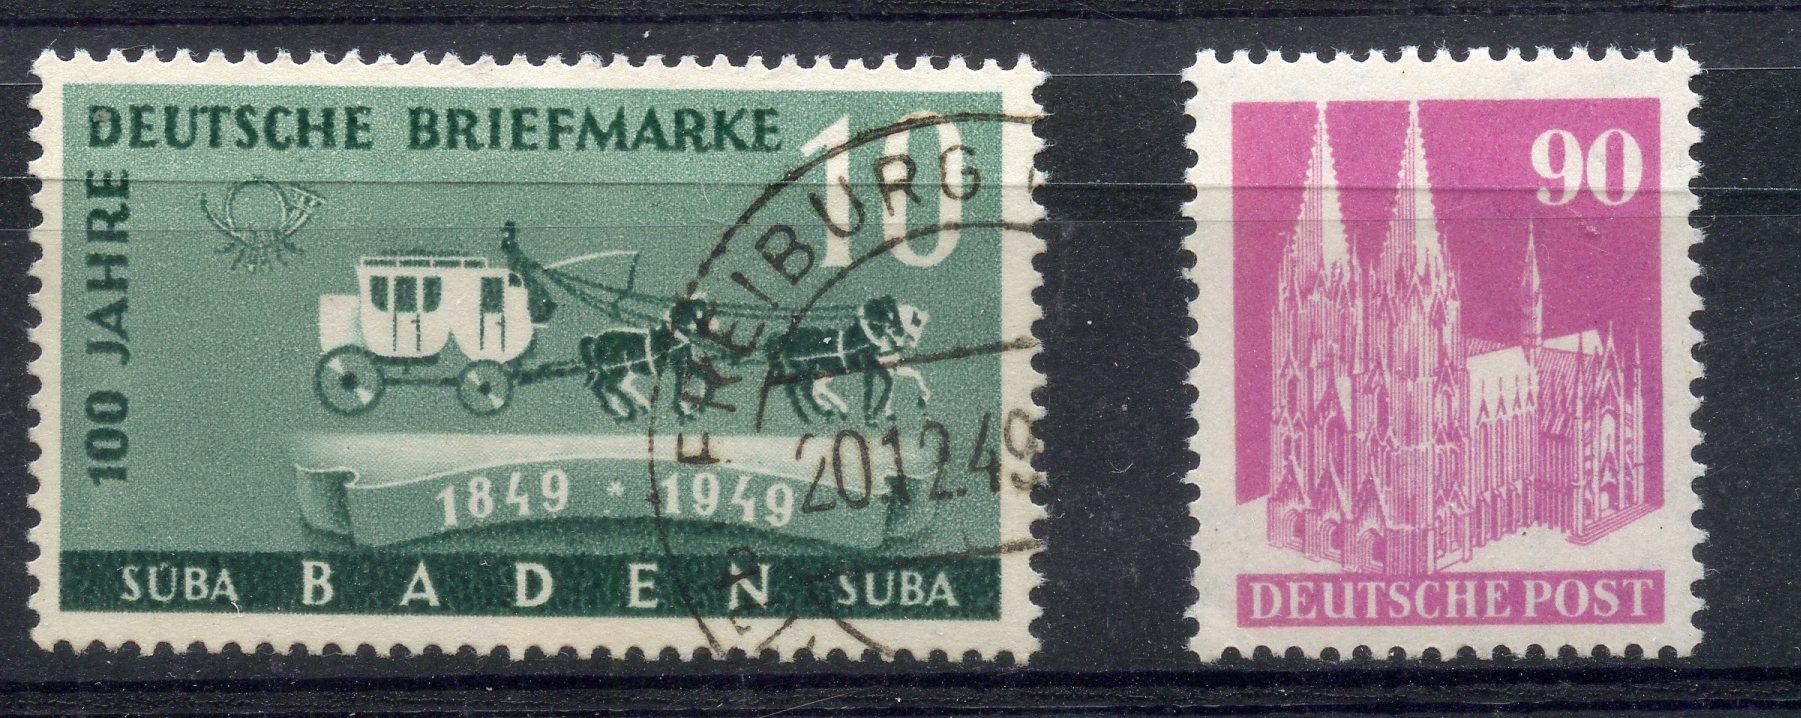 GERMAN ALLIED OCC BR & AMERICAN ZONE 1948 - 50 90pf bright purple type 3 perf 14 um. SG A131ba.